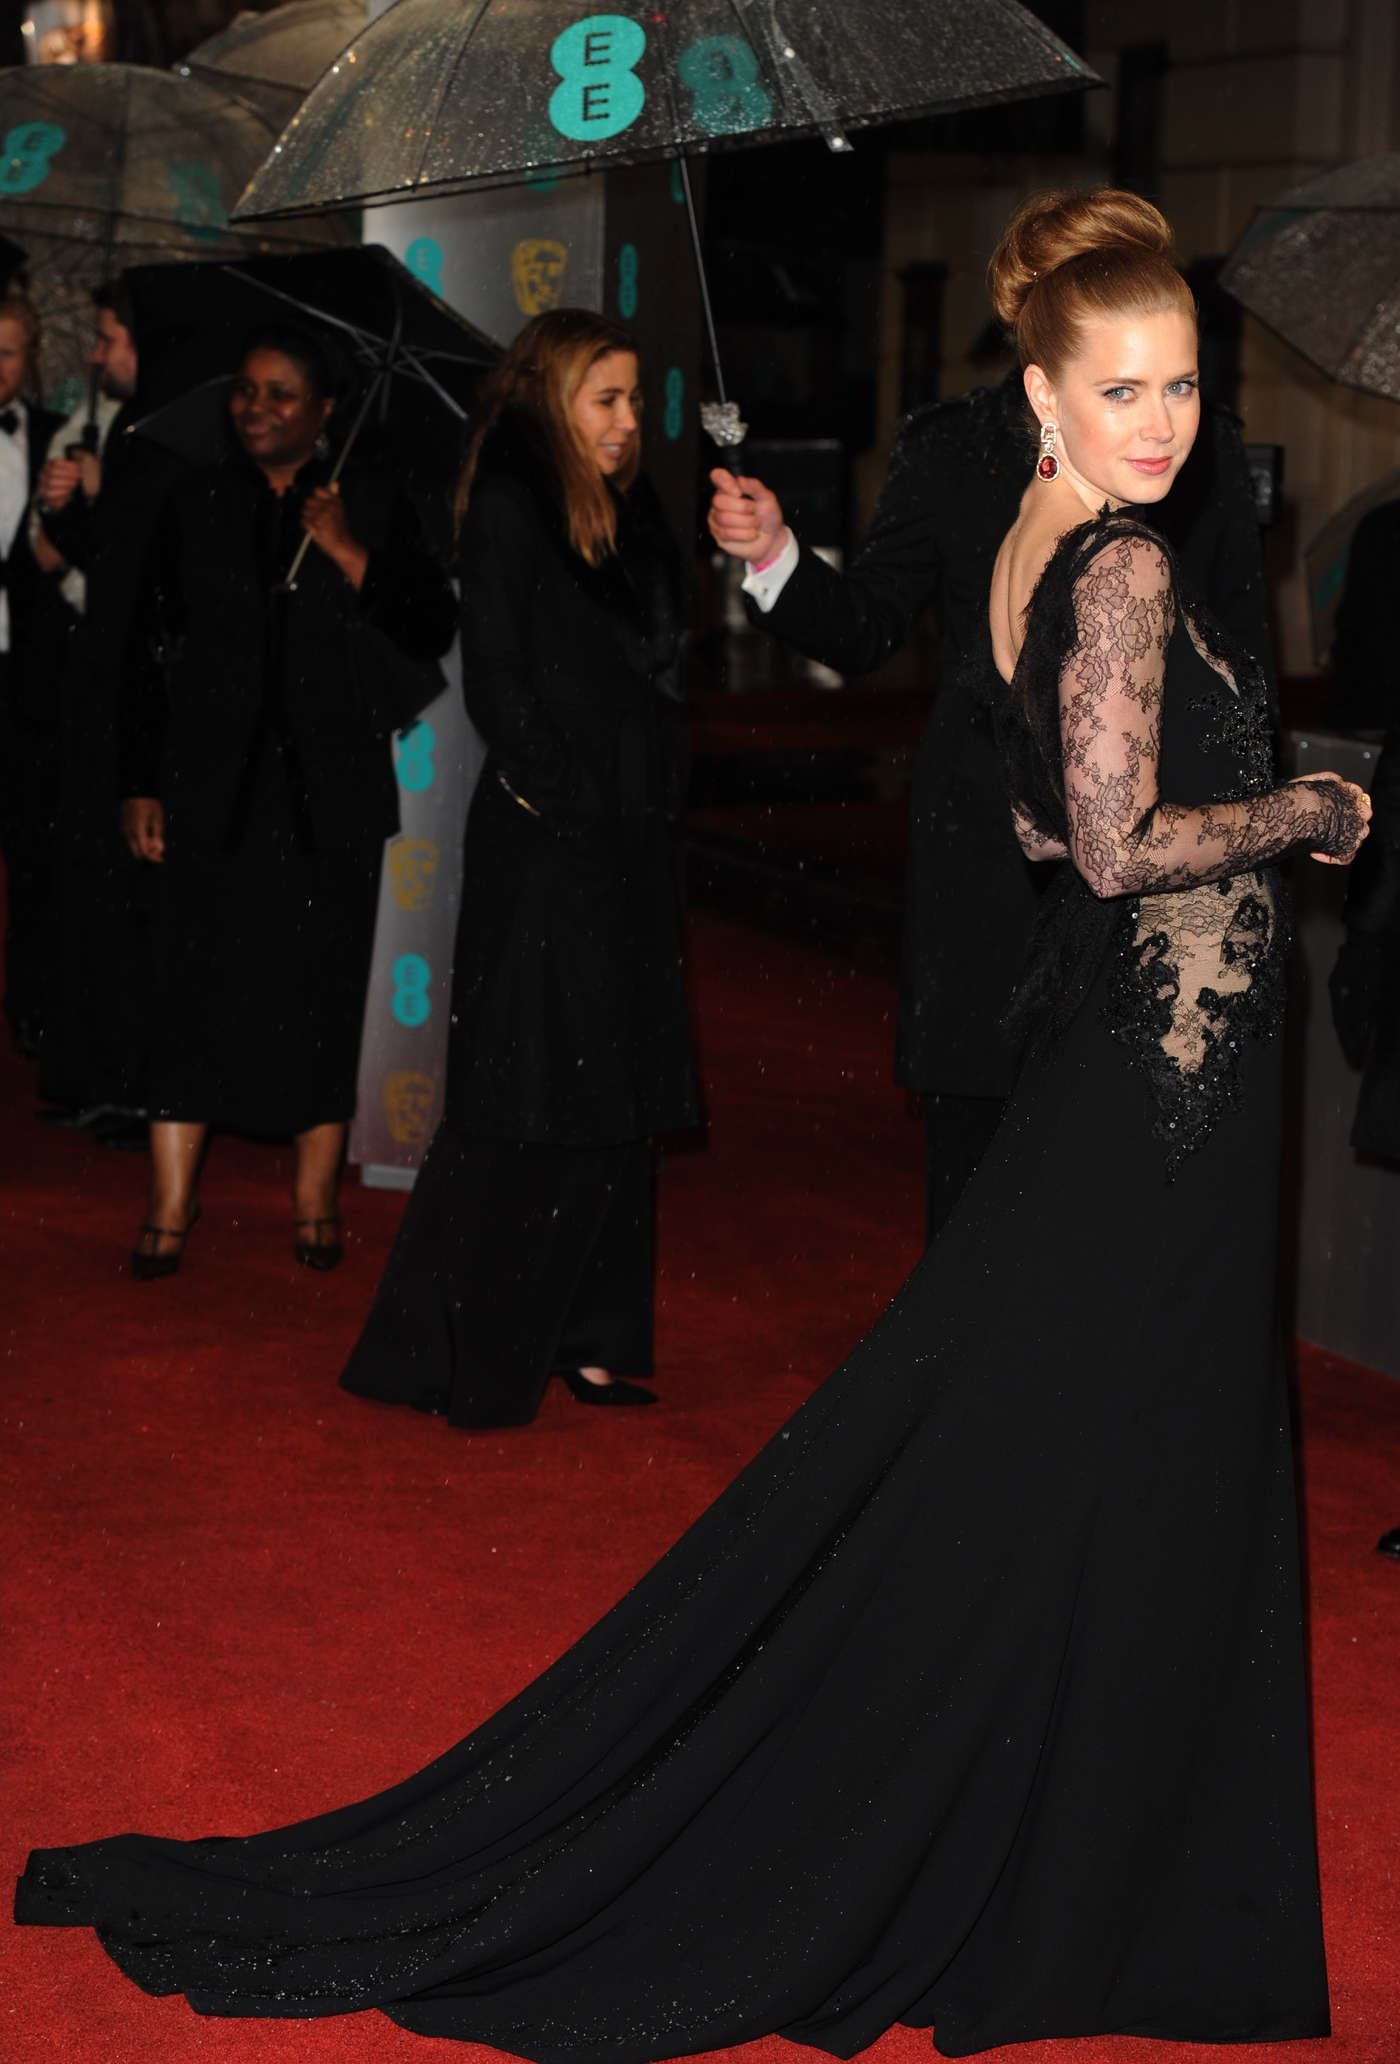 Amy Adams in Elie Saab at the 2013 BAFTA Awards